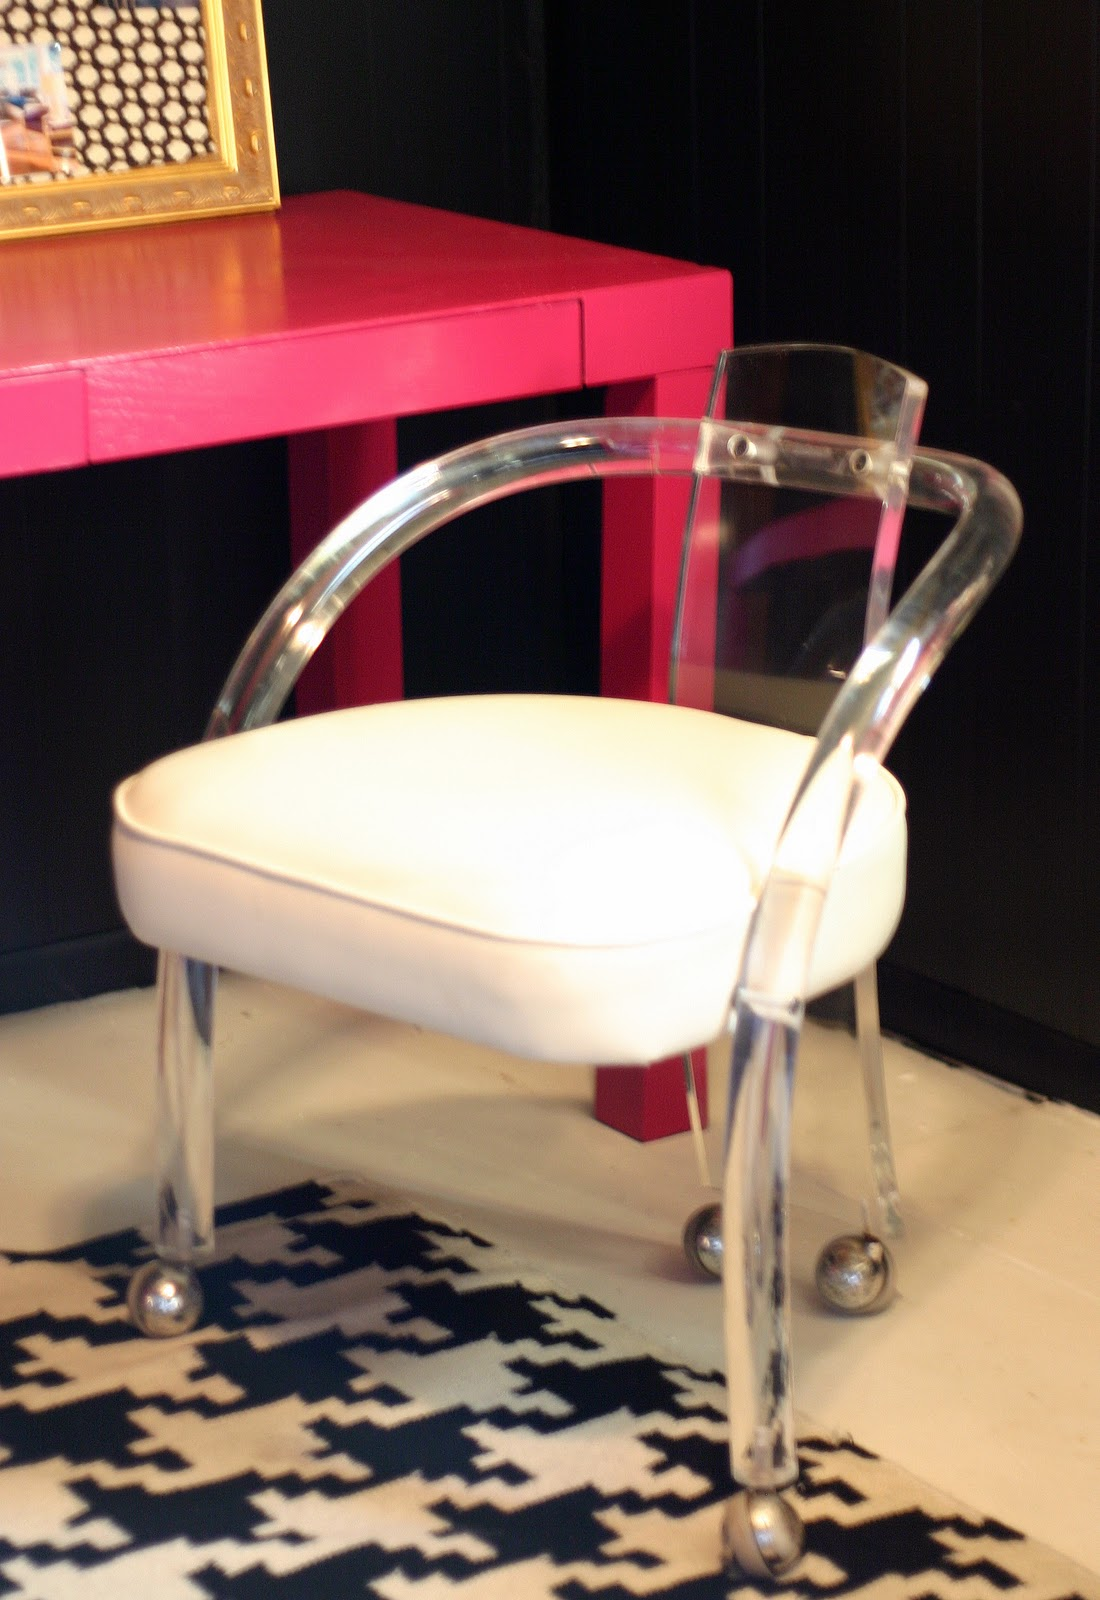 http://1.bp.blogspot.com/_fCaWwKiNPuQ/TOVMVAt2WtI/AAAAAAAAAFI/iEkFPWSKNHw/s1600/curved+lucite+chair+upholsted+acrylic+chair.JPG